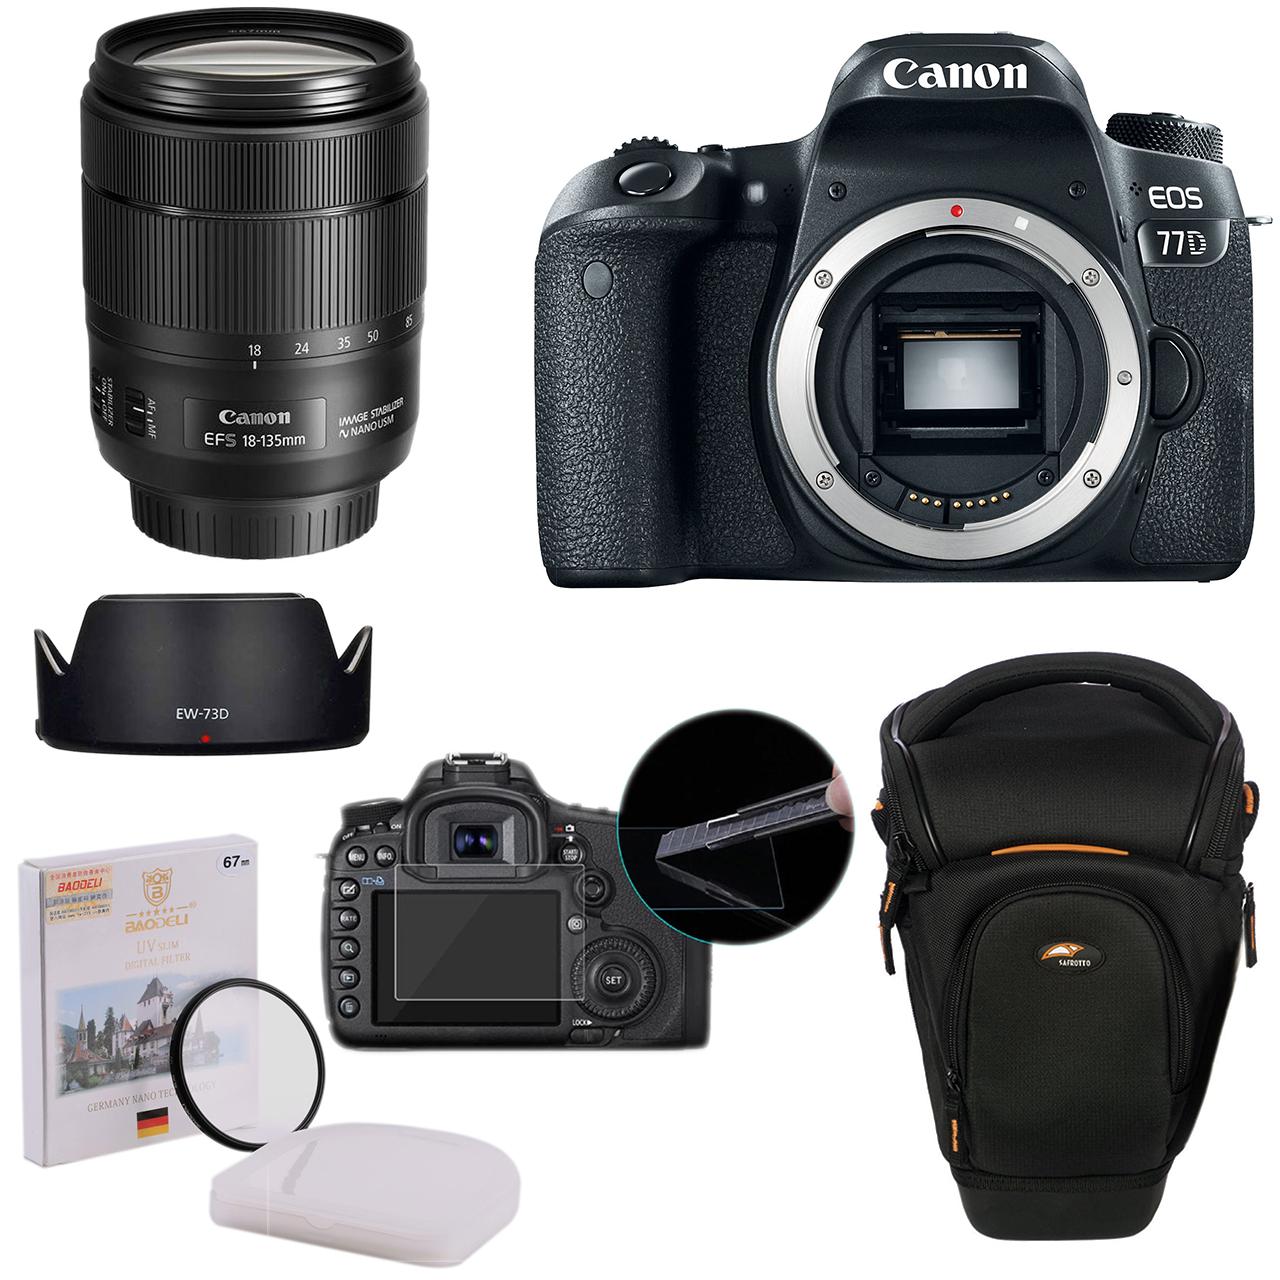 پک دوربین عکاسی کانن مدل 77D به همراه لنز 18_135 USM